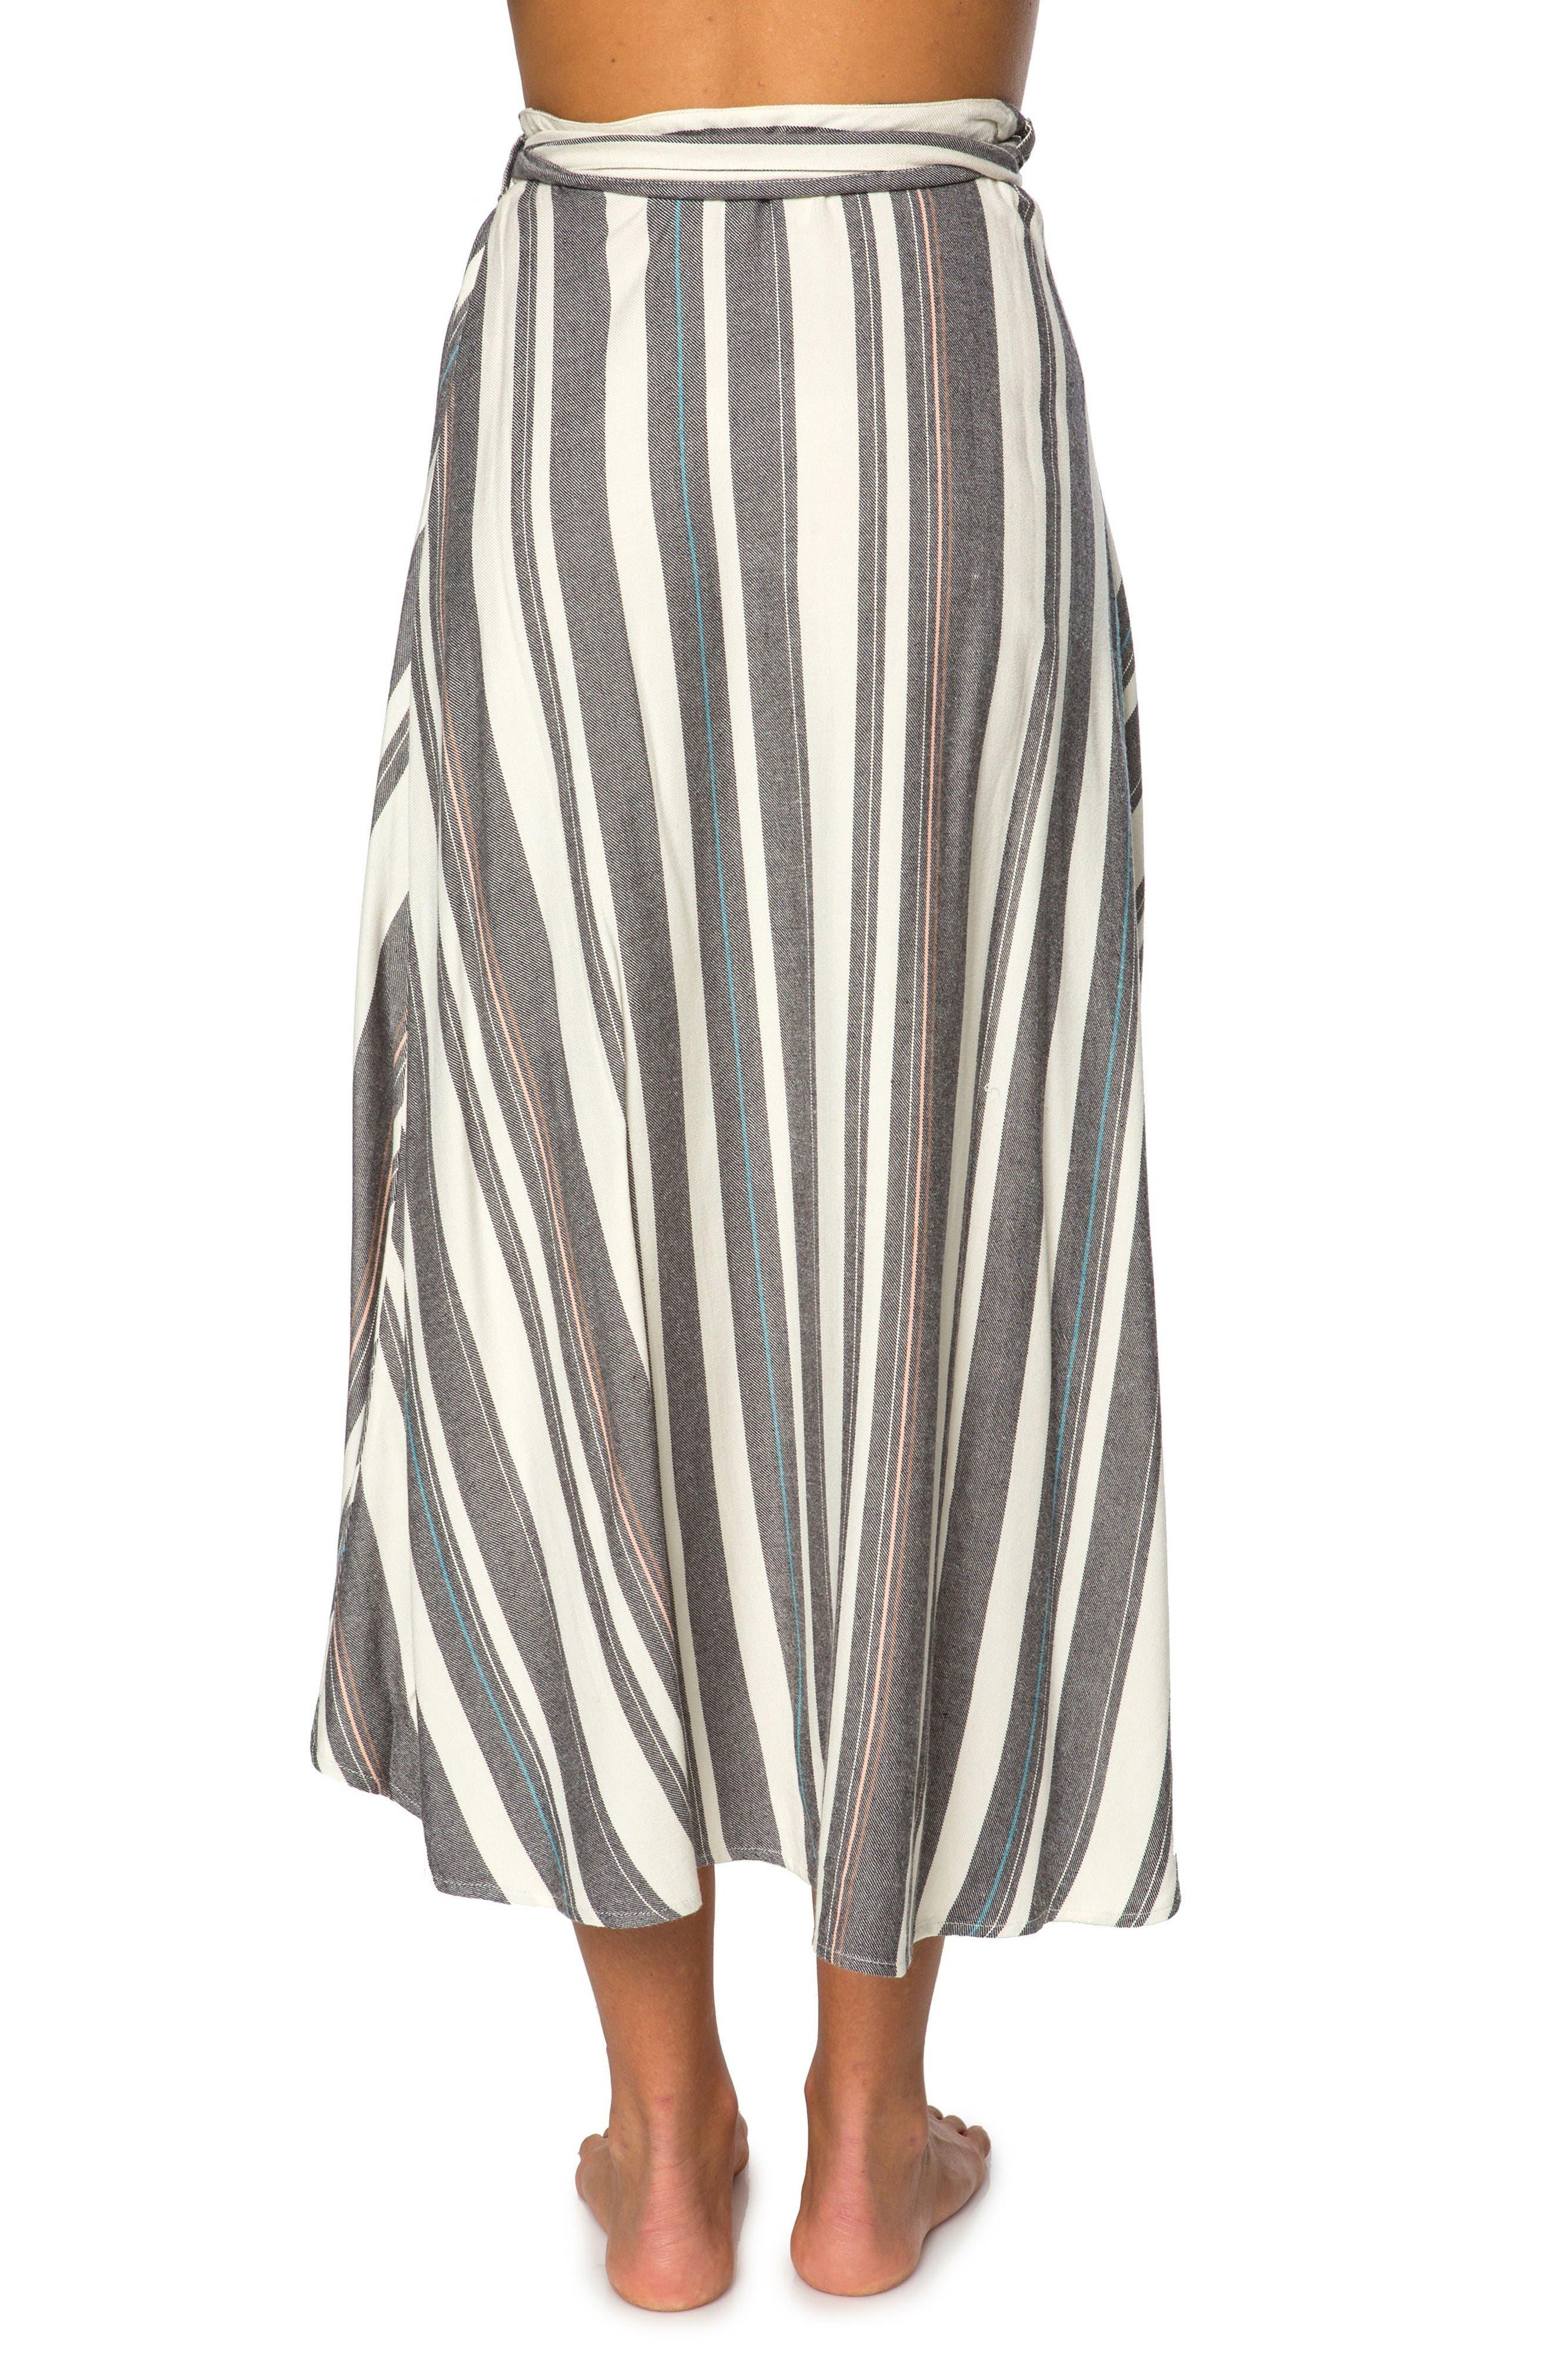 Alternate Image 2  - O'Neill x Natalie Off Duty Savi Woven Skirt